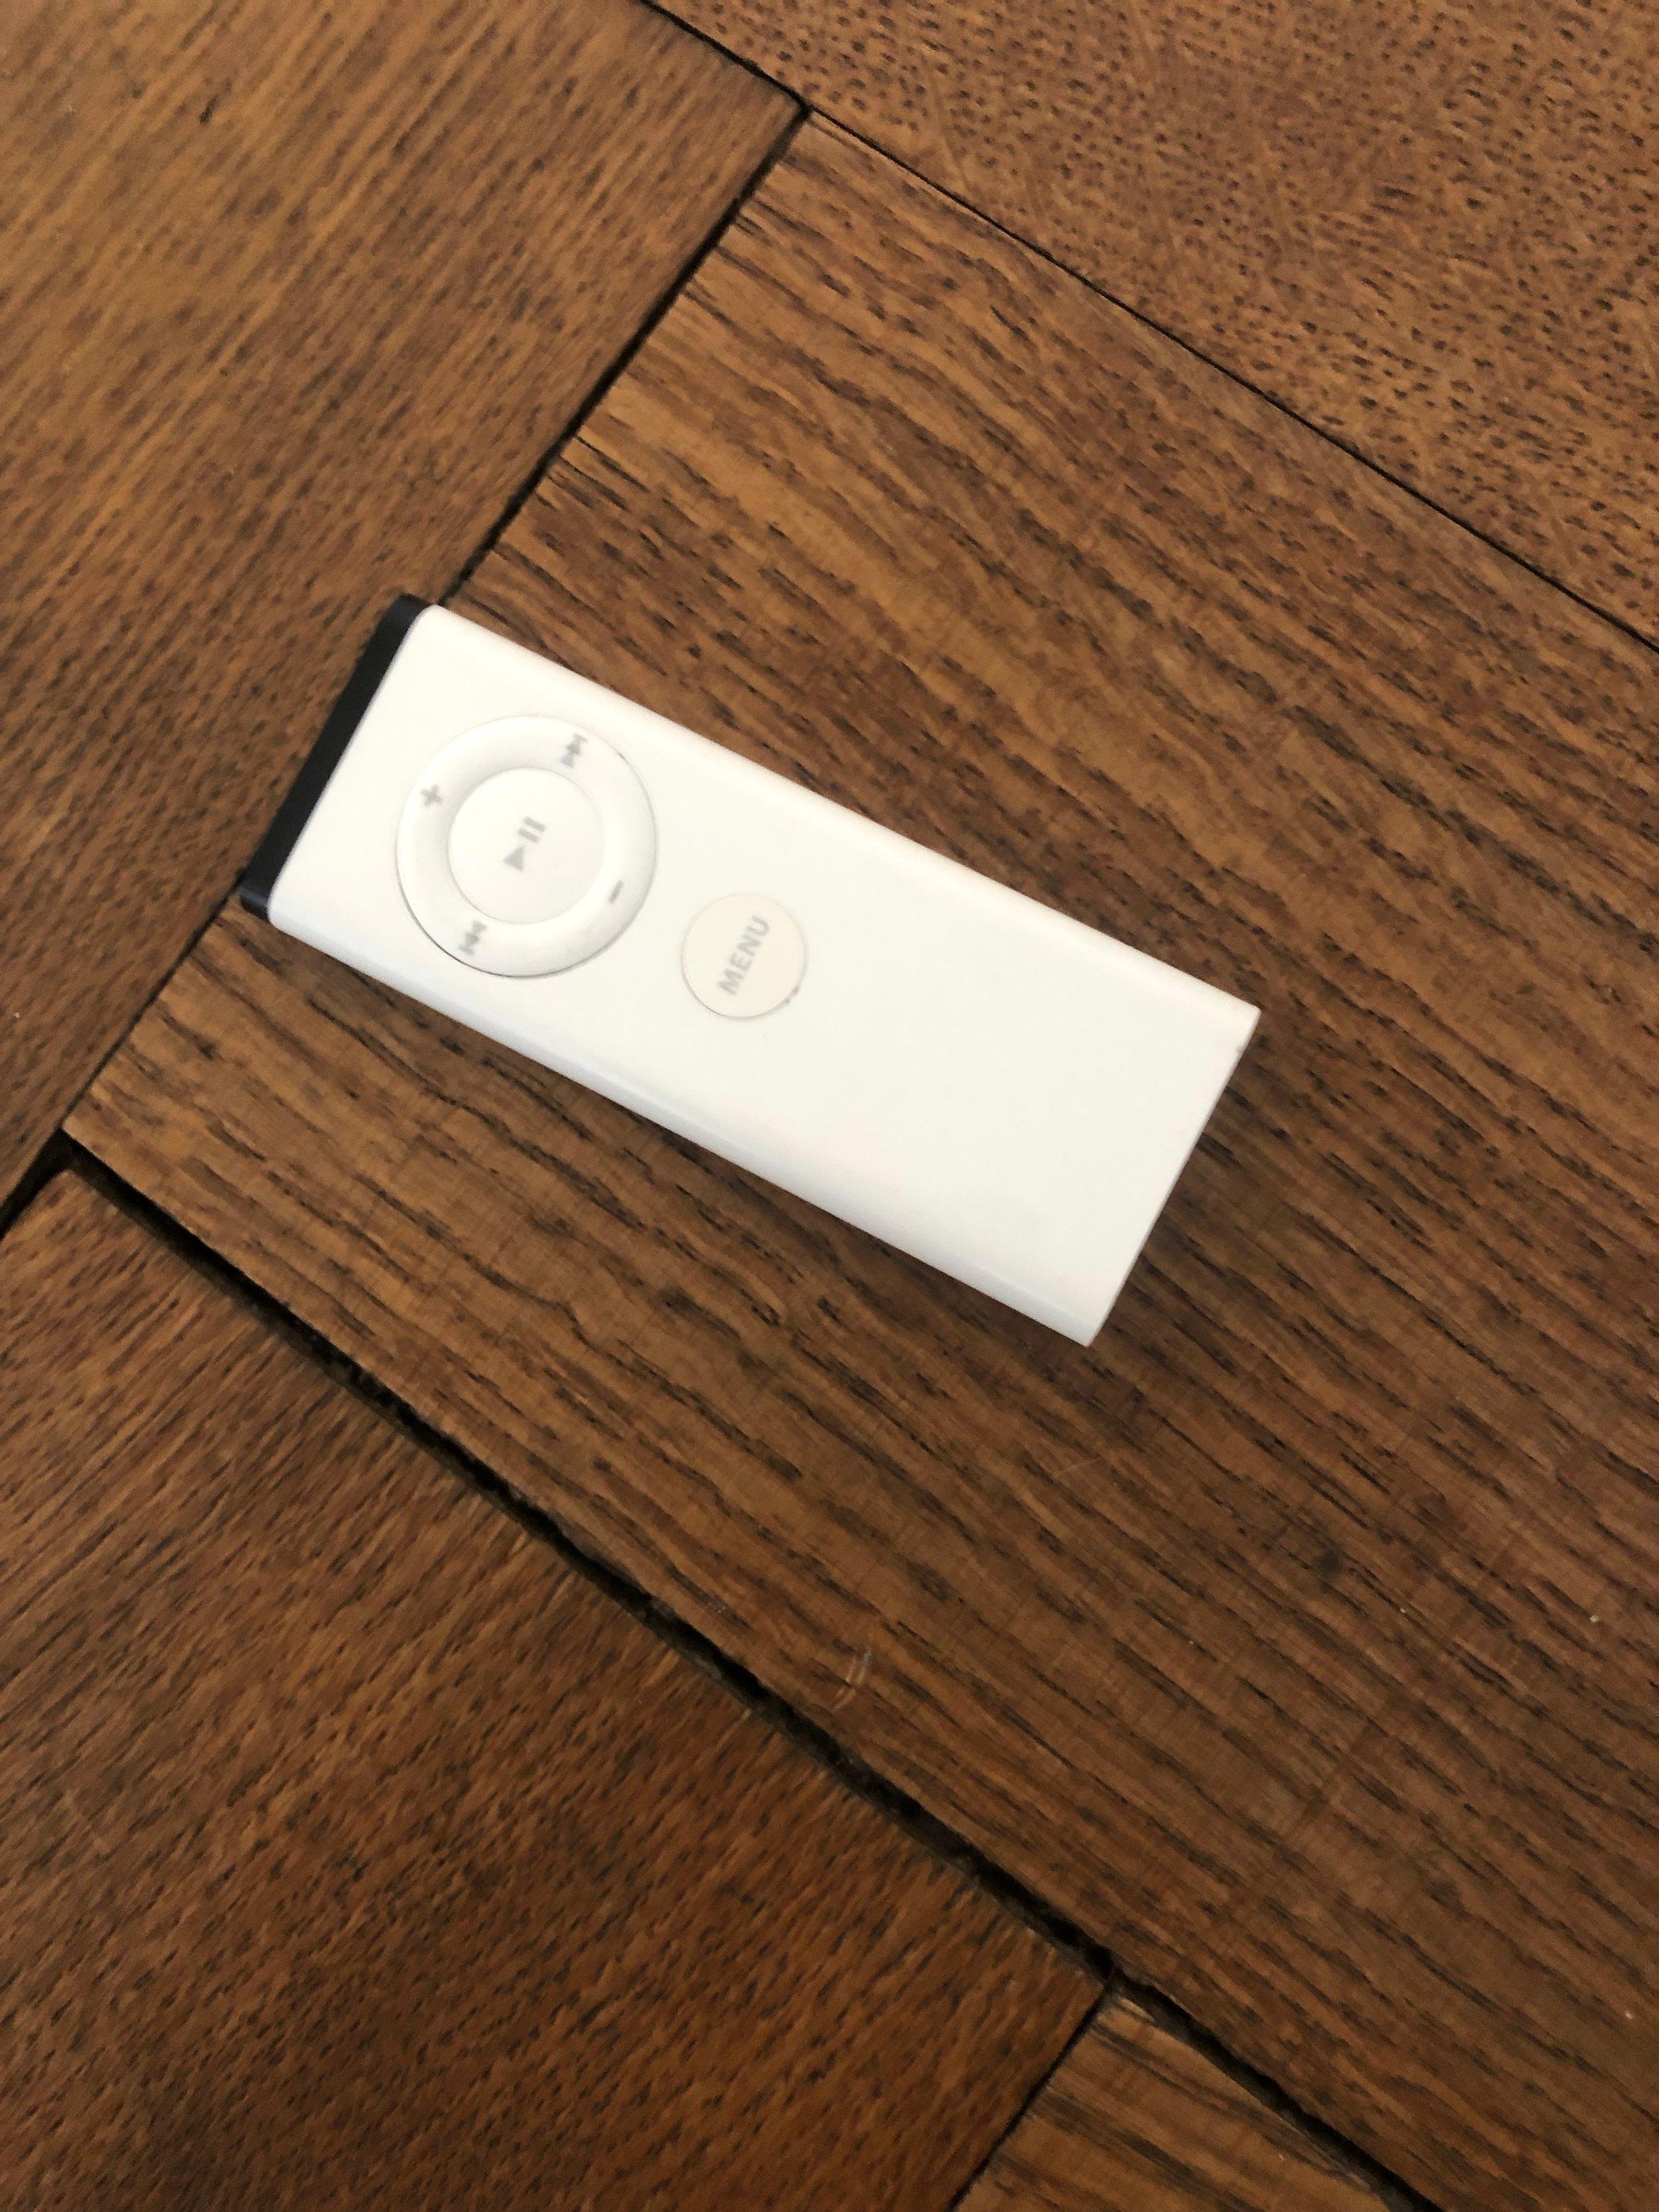 Apple TV Remote (old)